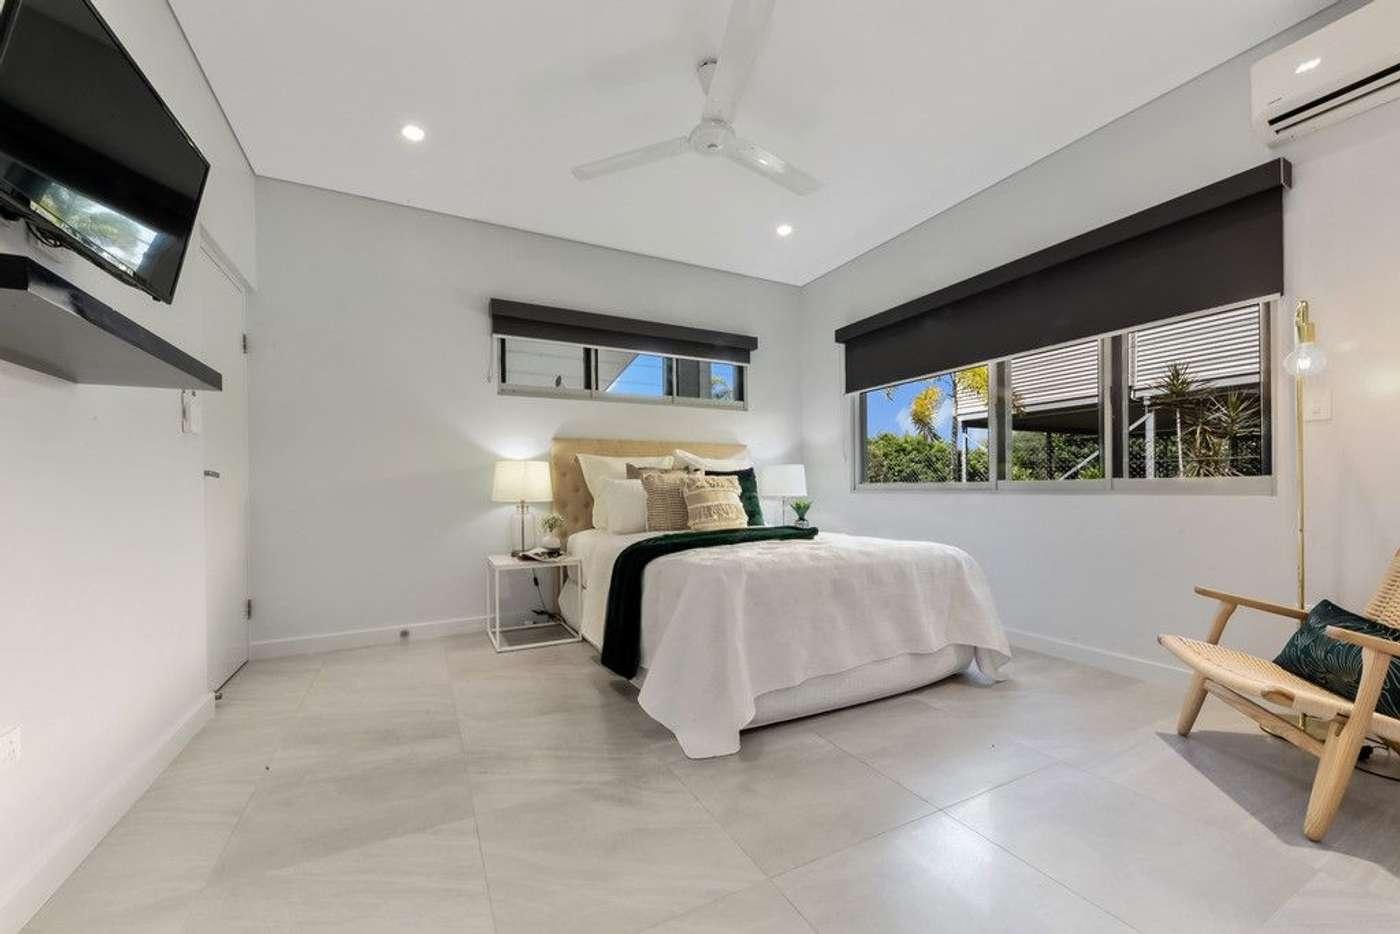 Sixth view of Homely house listing, 48 Blackburn Street, Muirhead NT 810